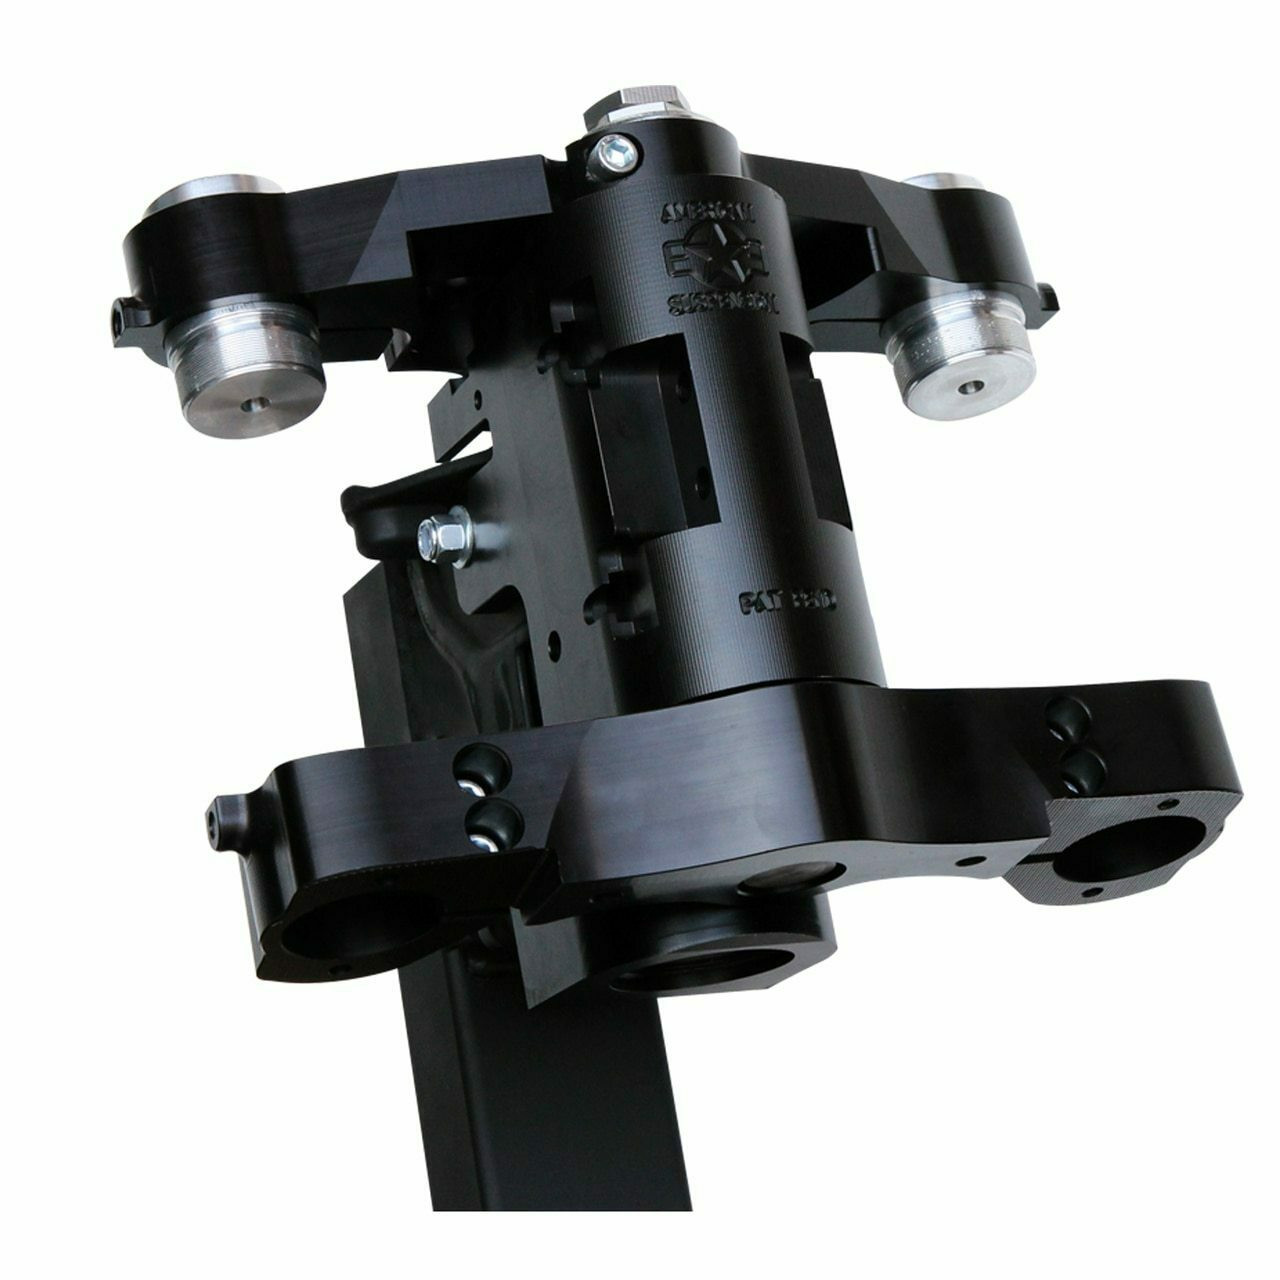 American Suspension bolt on neck kit for 30 inch Wheel